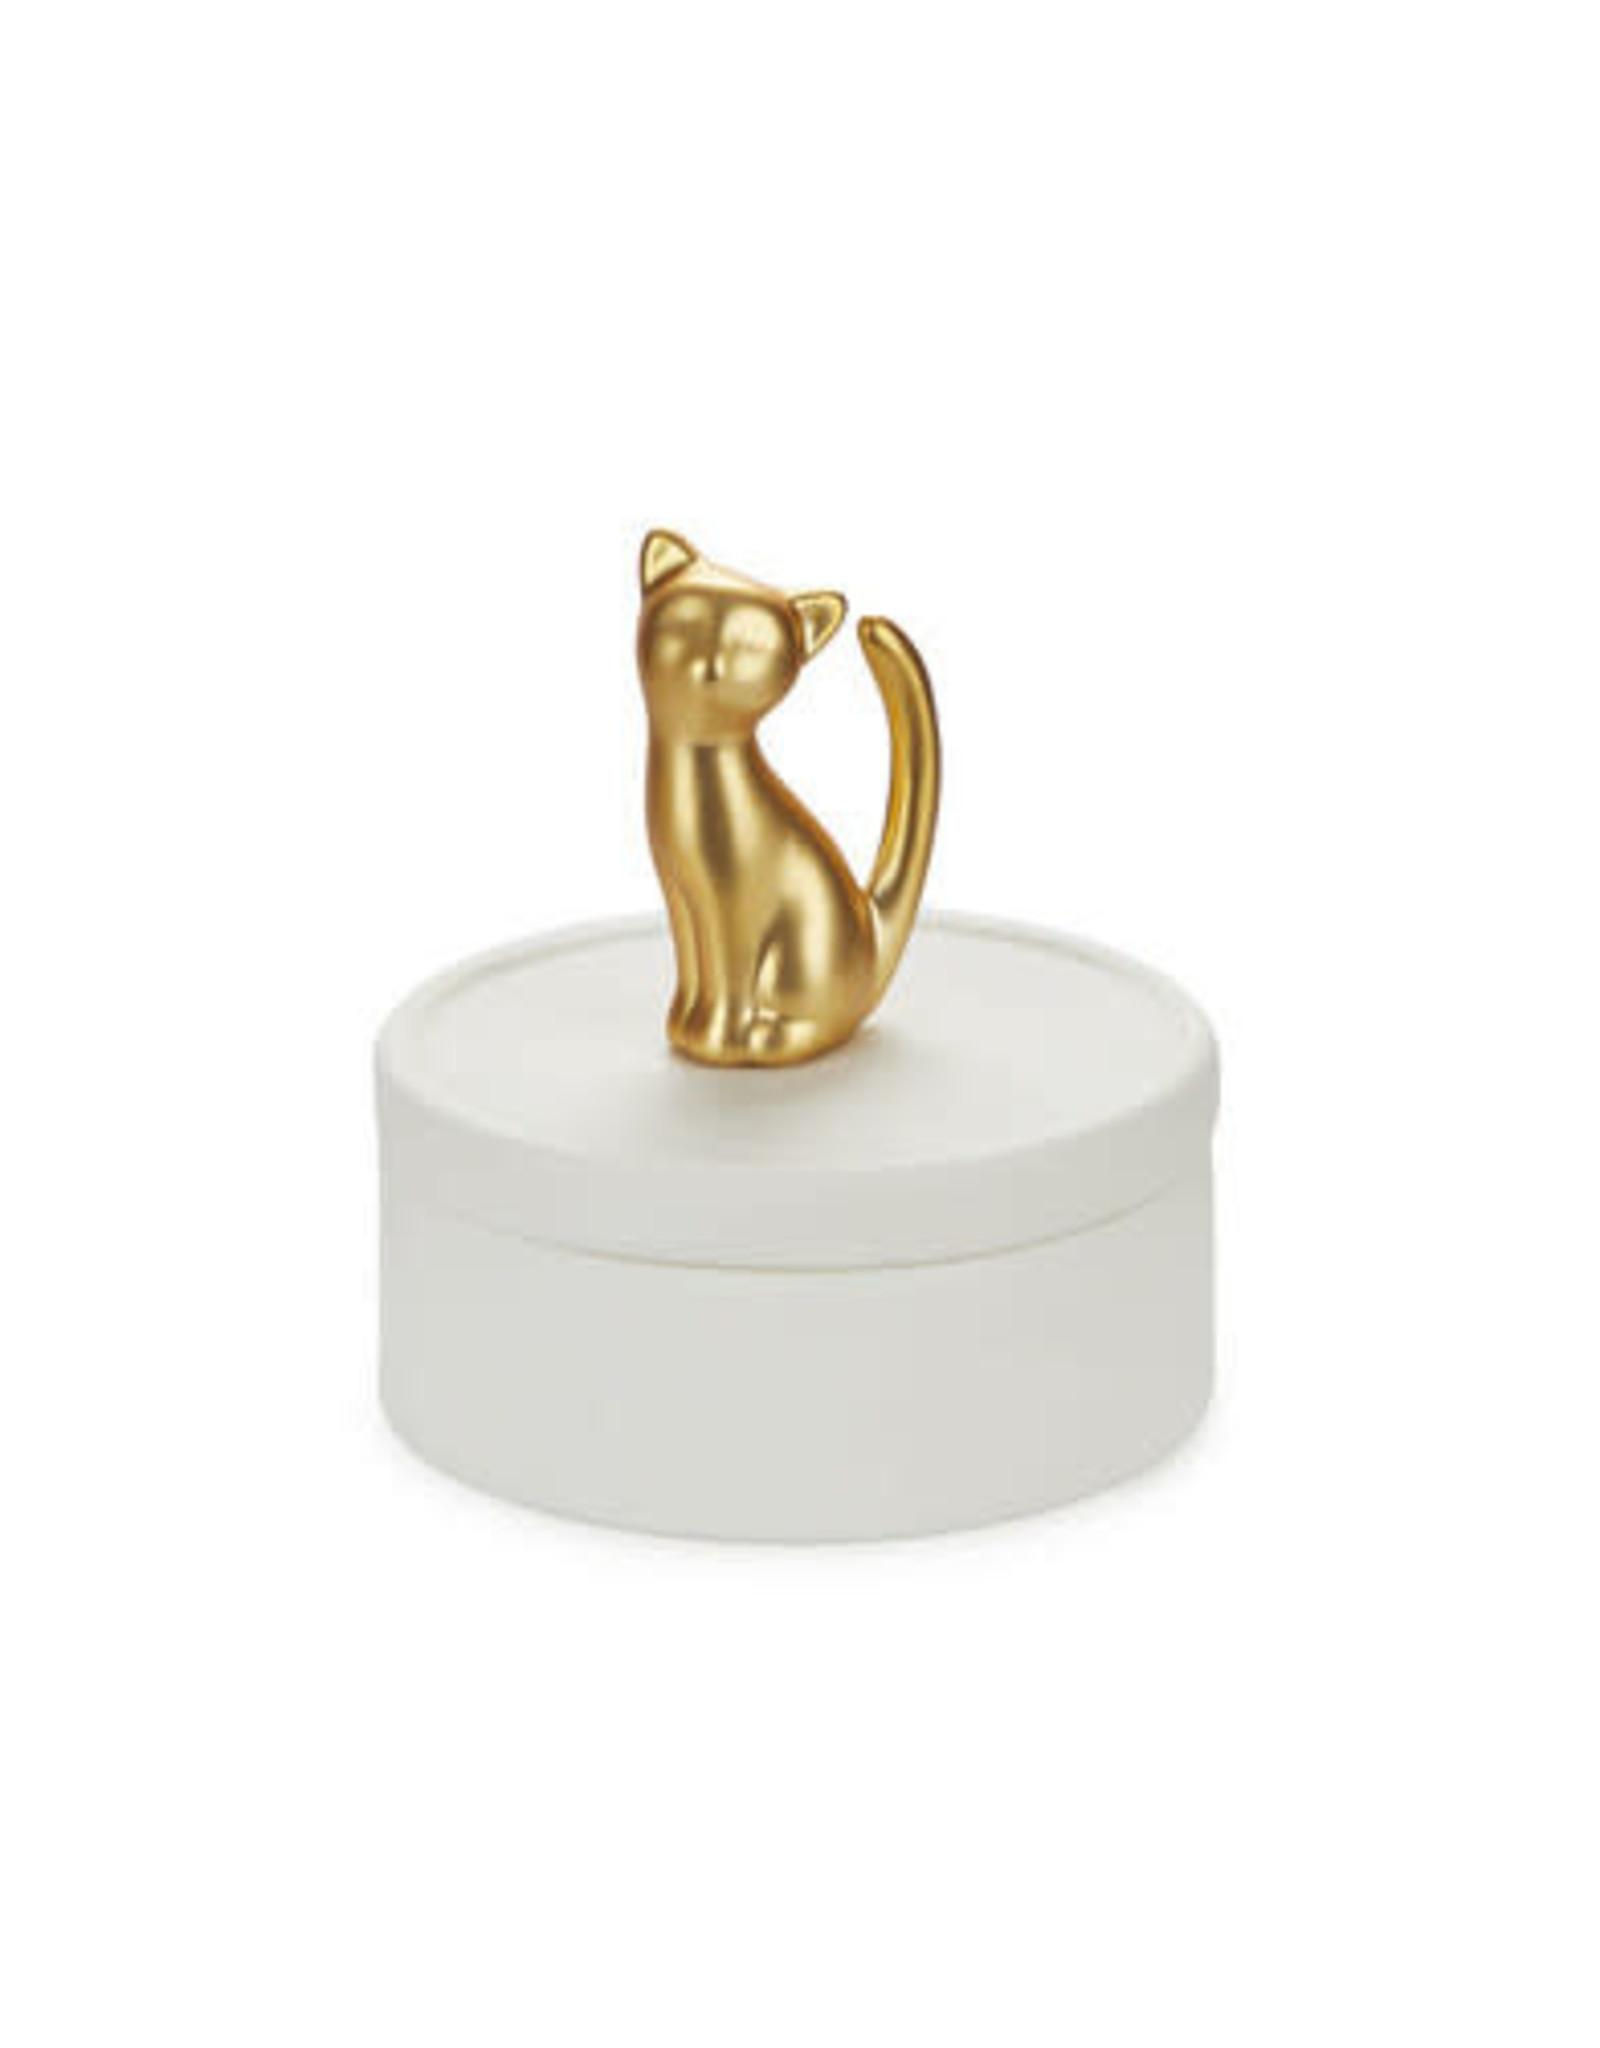 jewelry box - kitten